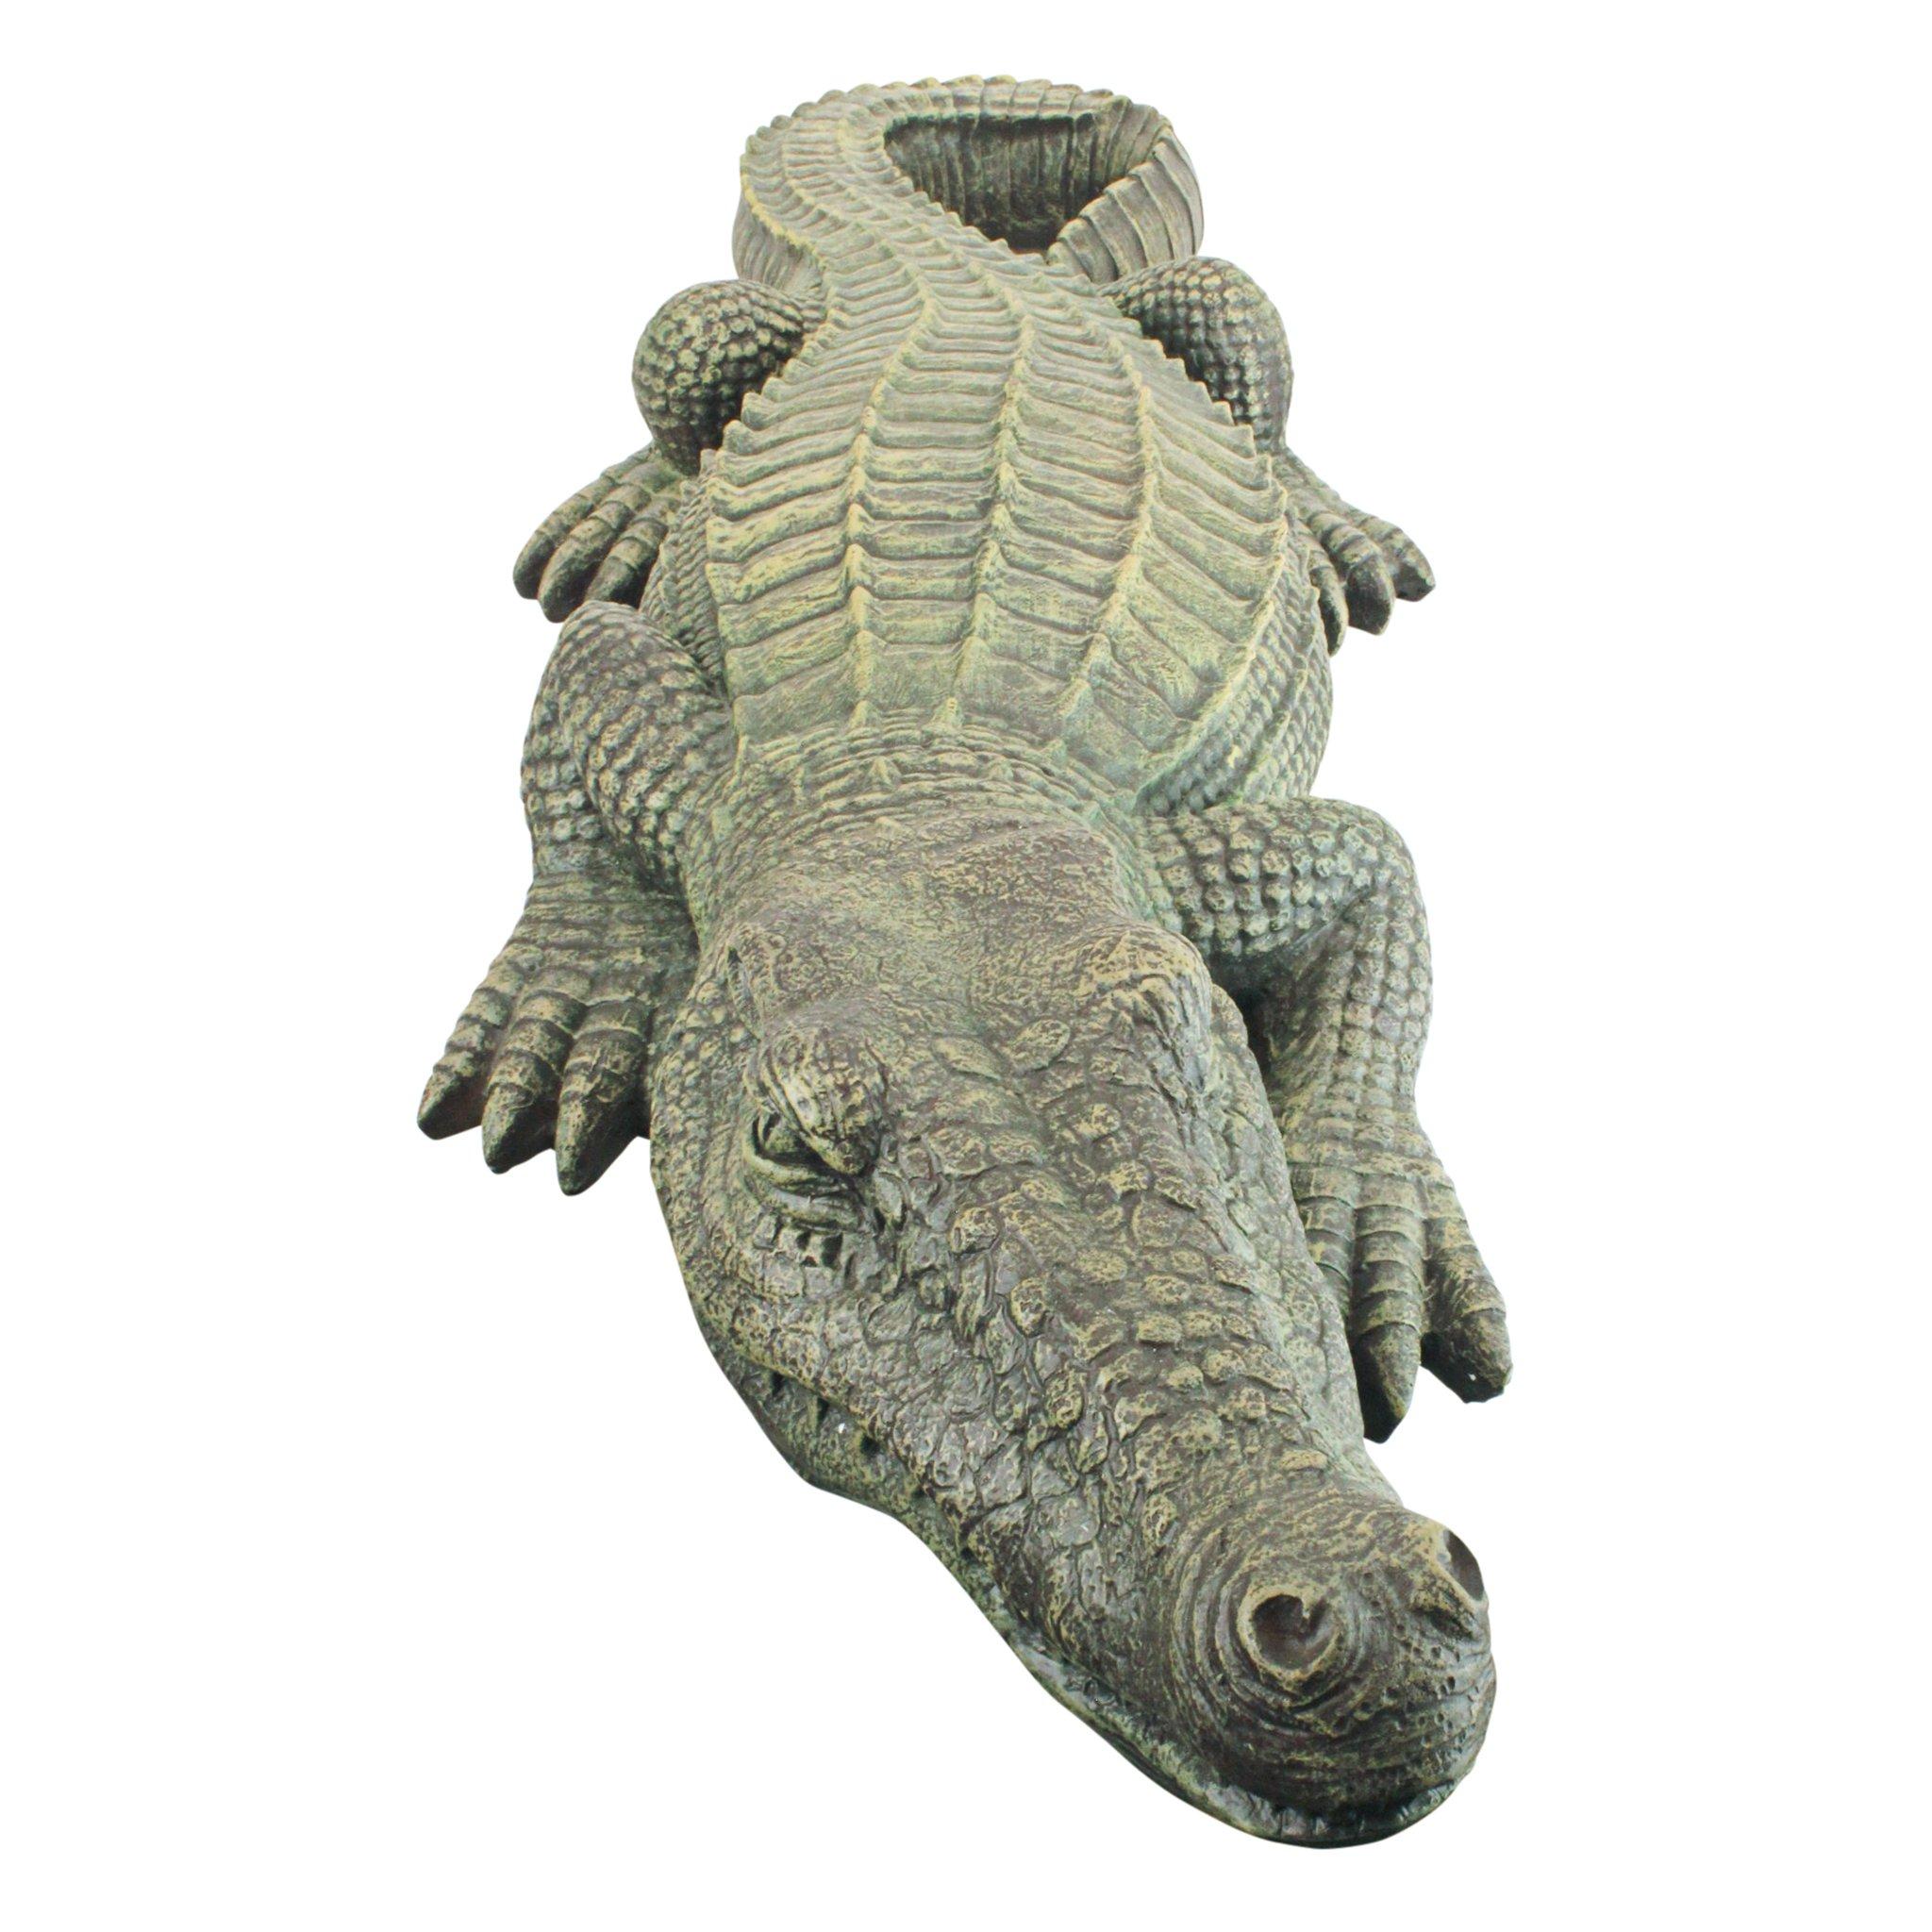 Design Toscano The Swamp Beast Lawn Alligator Crocodile Garden Sculpture, 37 Inch, Polyresin, Full Color by Design Toscano (Image #5)